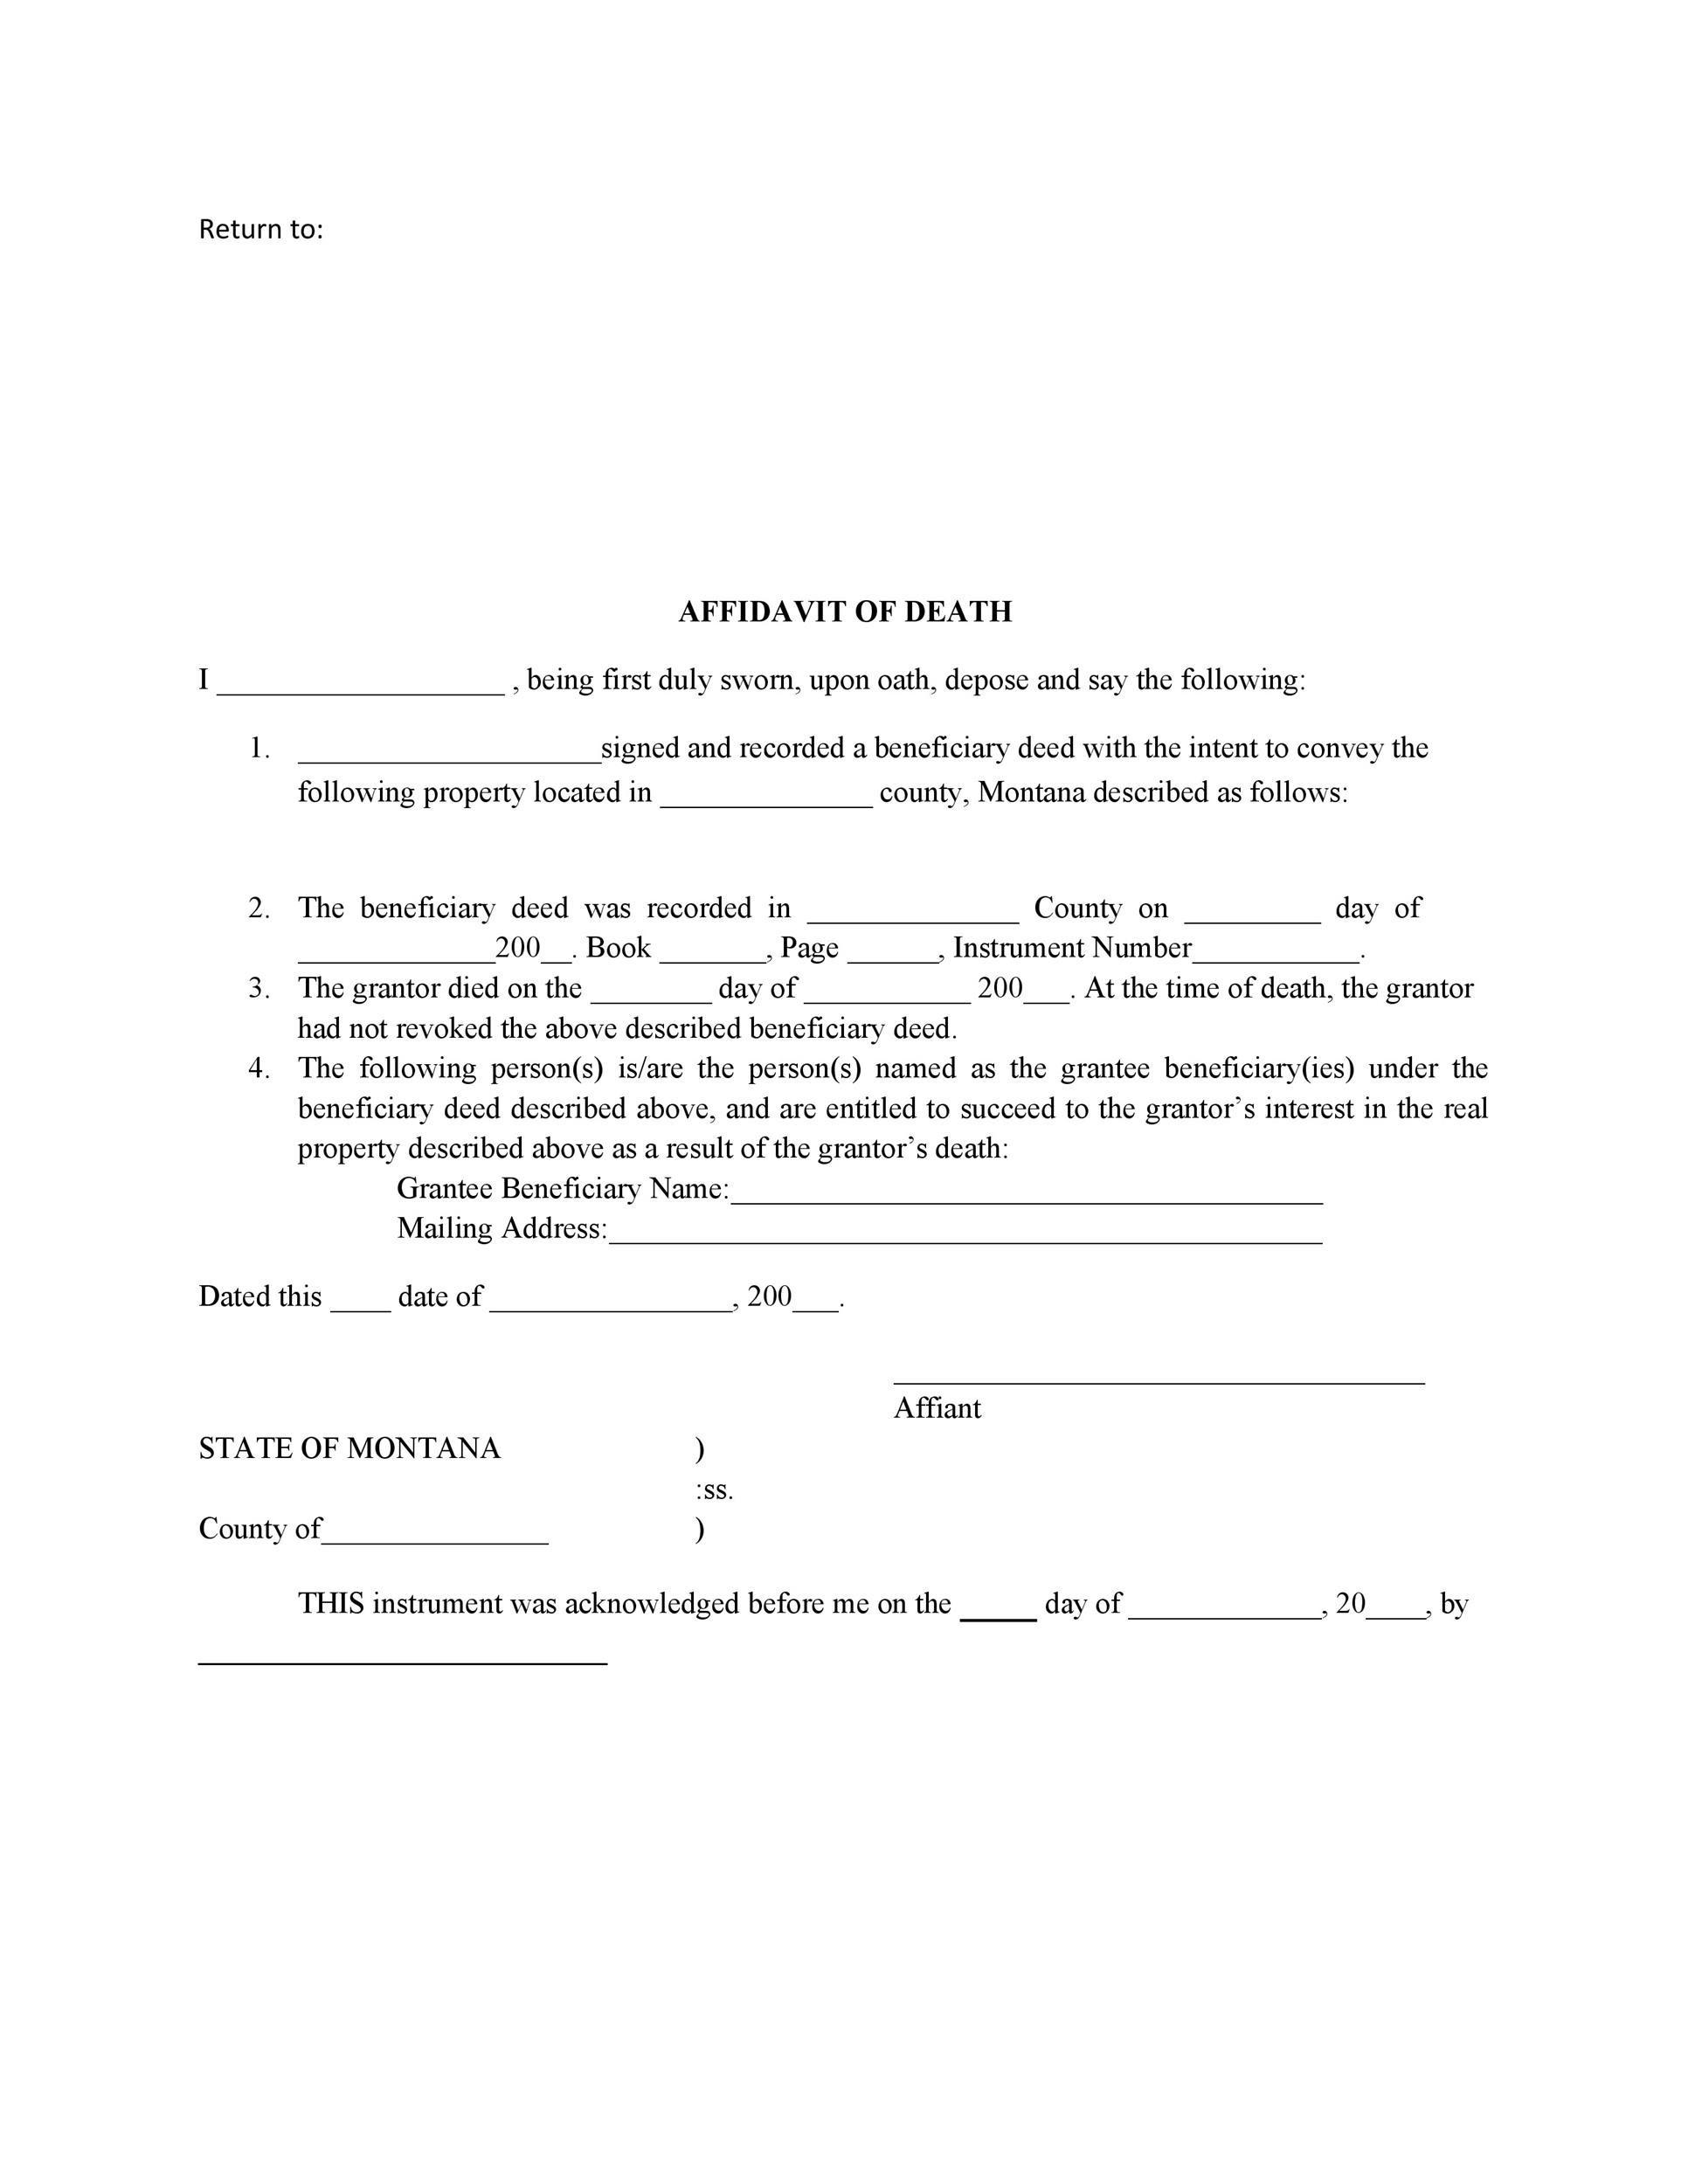 Free affidavit of death 12